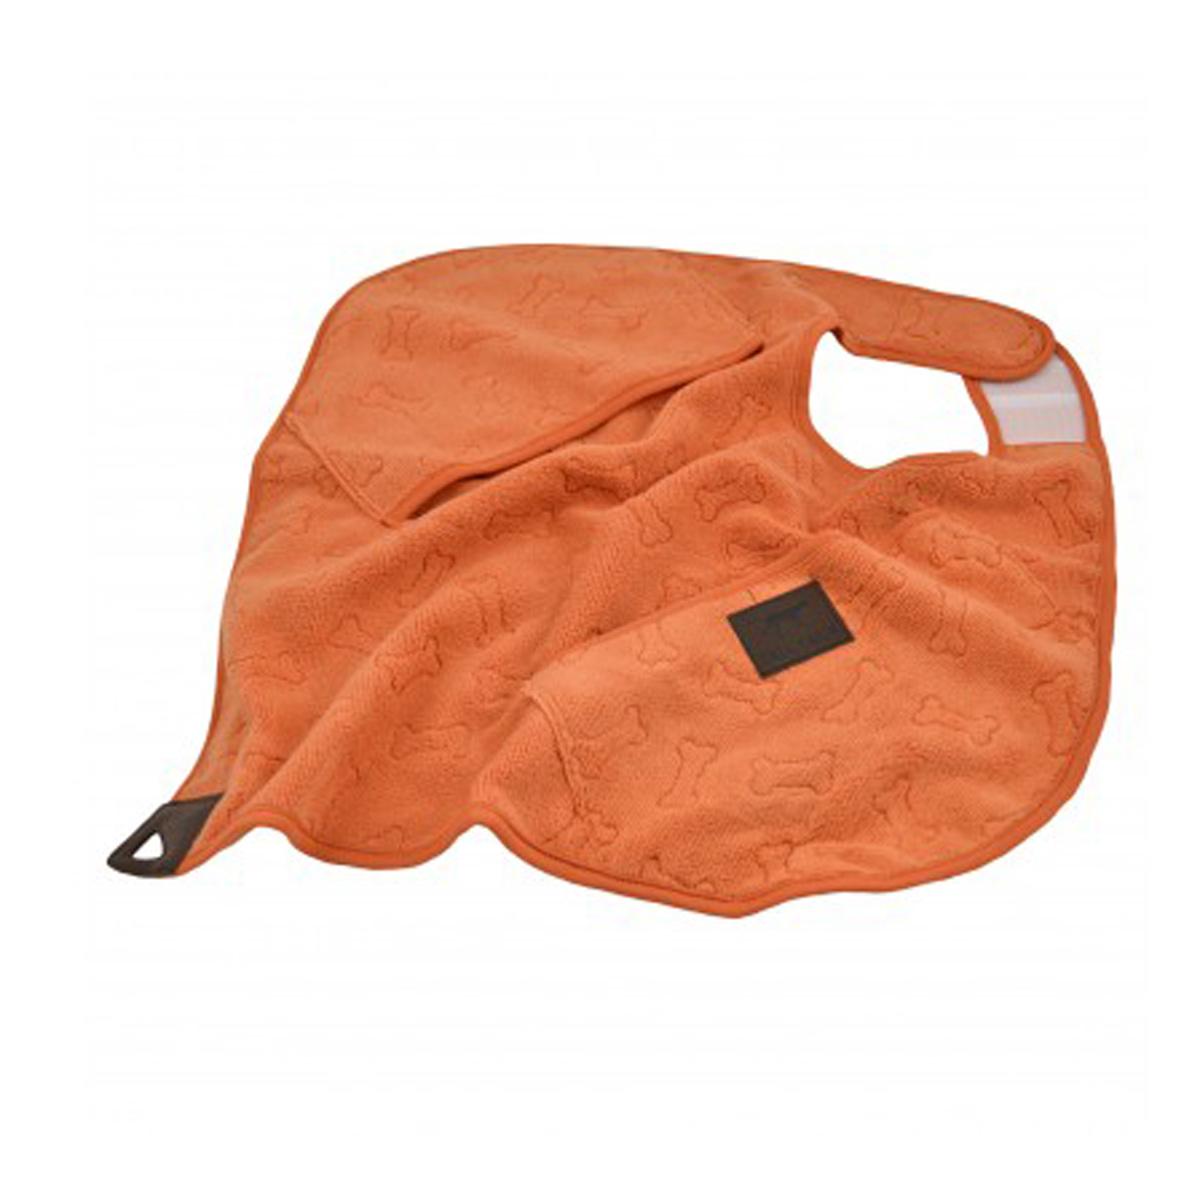 Tall Tails Cape Dog Towel Orange Bone With Same Day